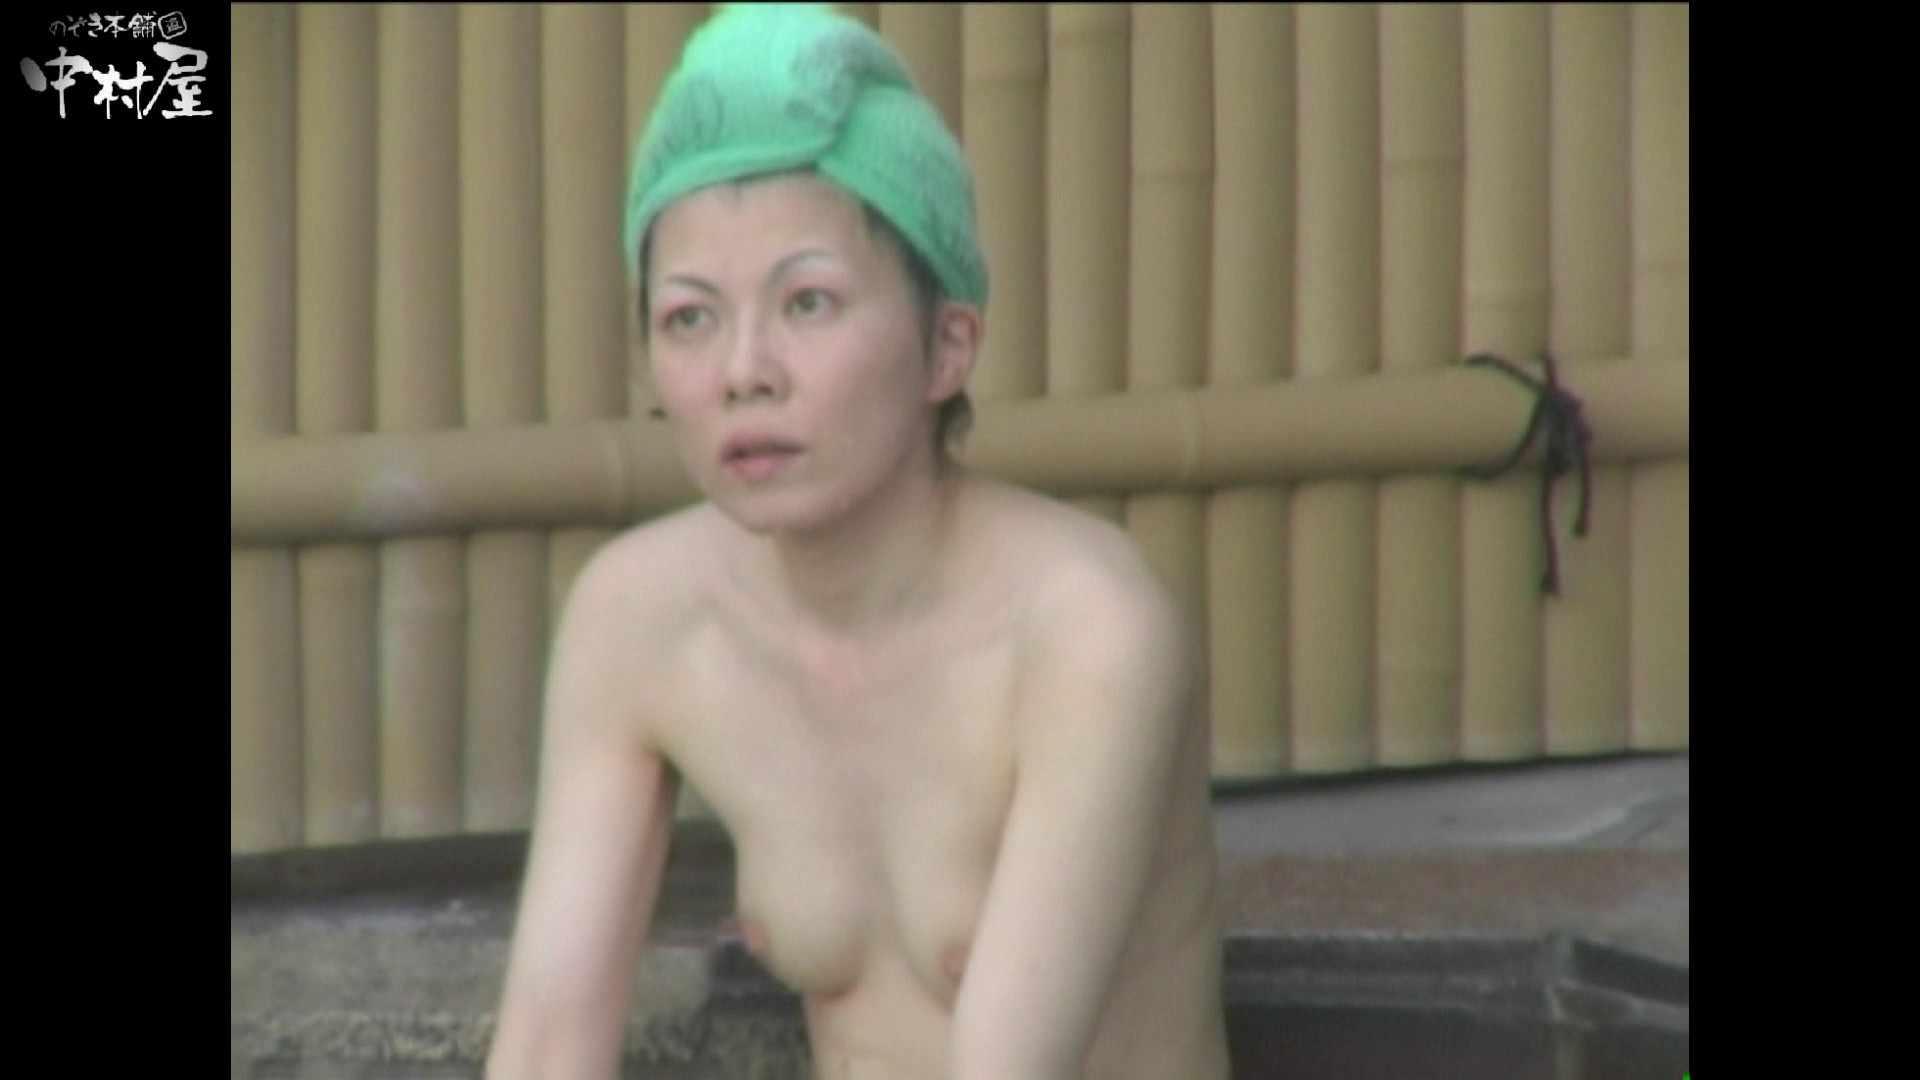 Aquaな露天風呂Vol.981 盗撮 エロ無料画像 50枚 17